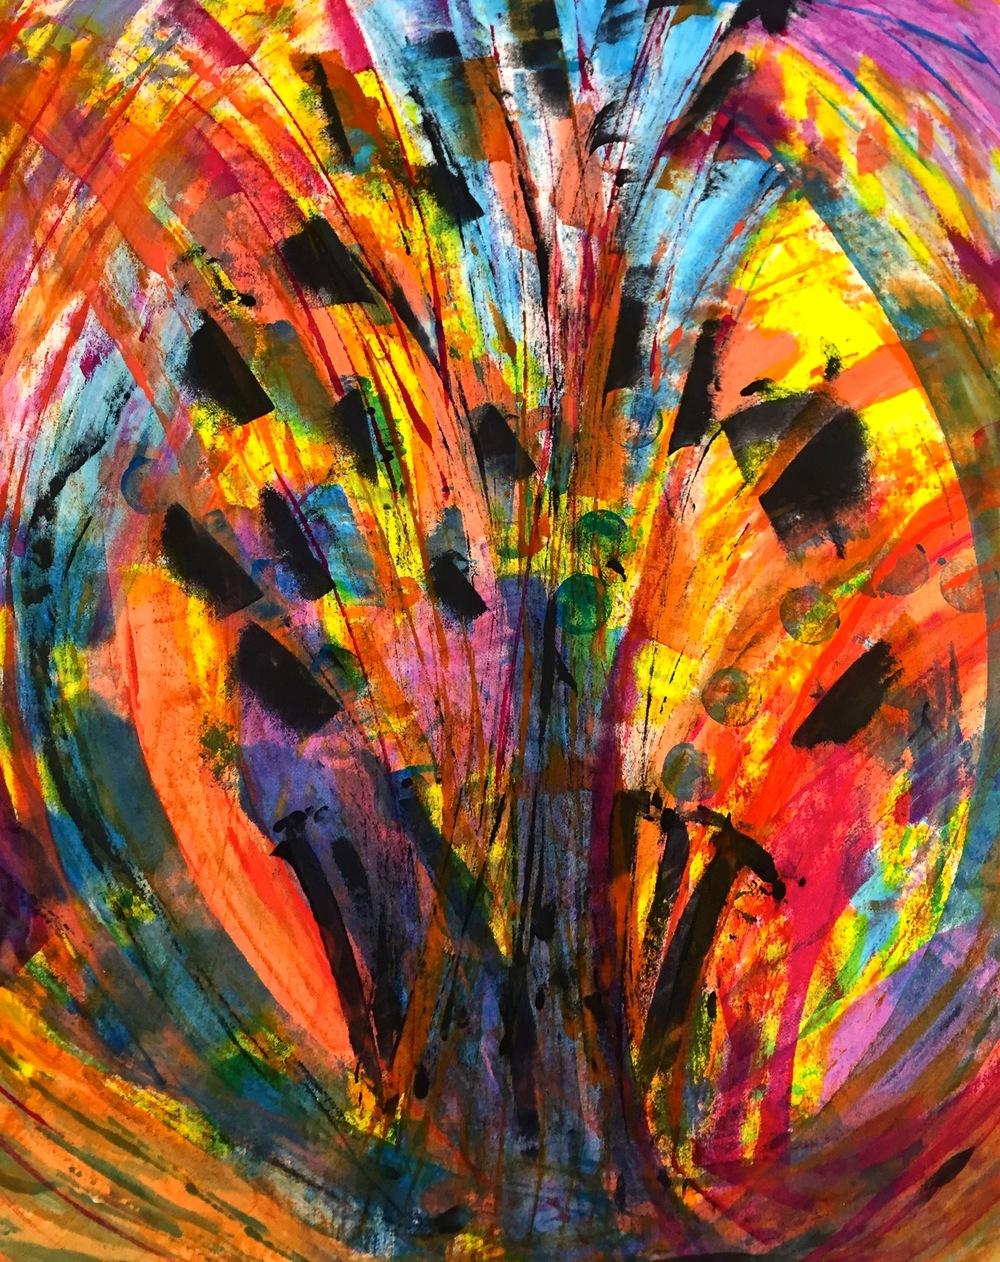 Toni's Abstract -.jpg